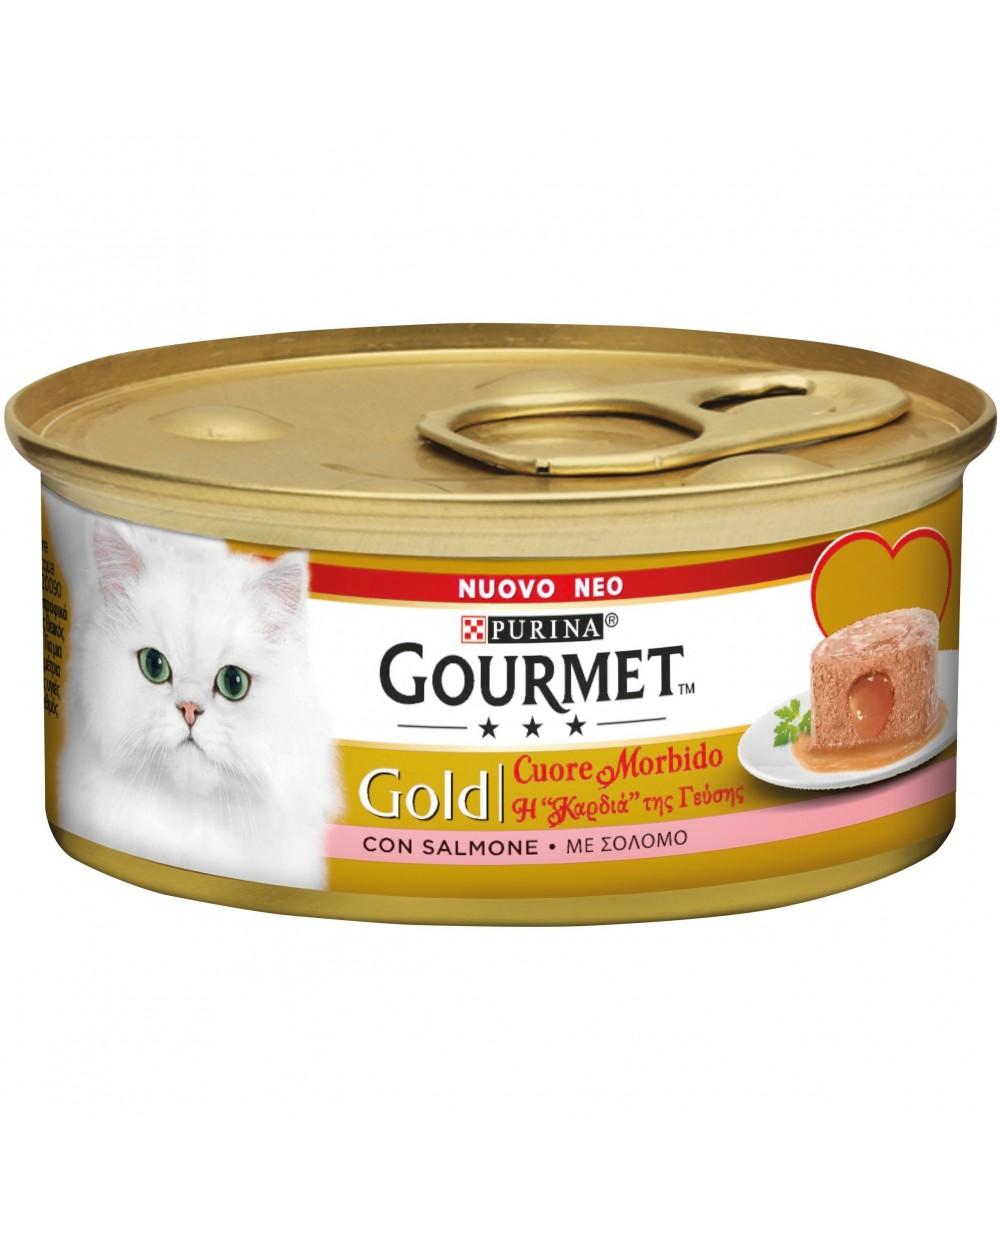 Gourmet Gold Cuore Morbido Salmone